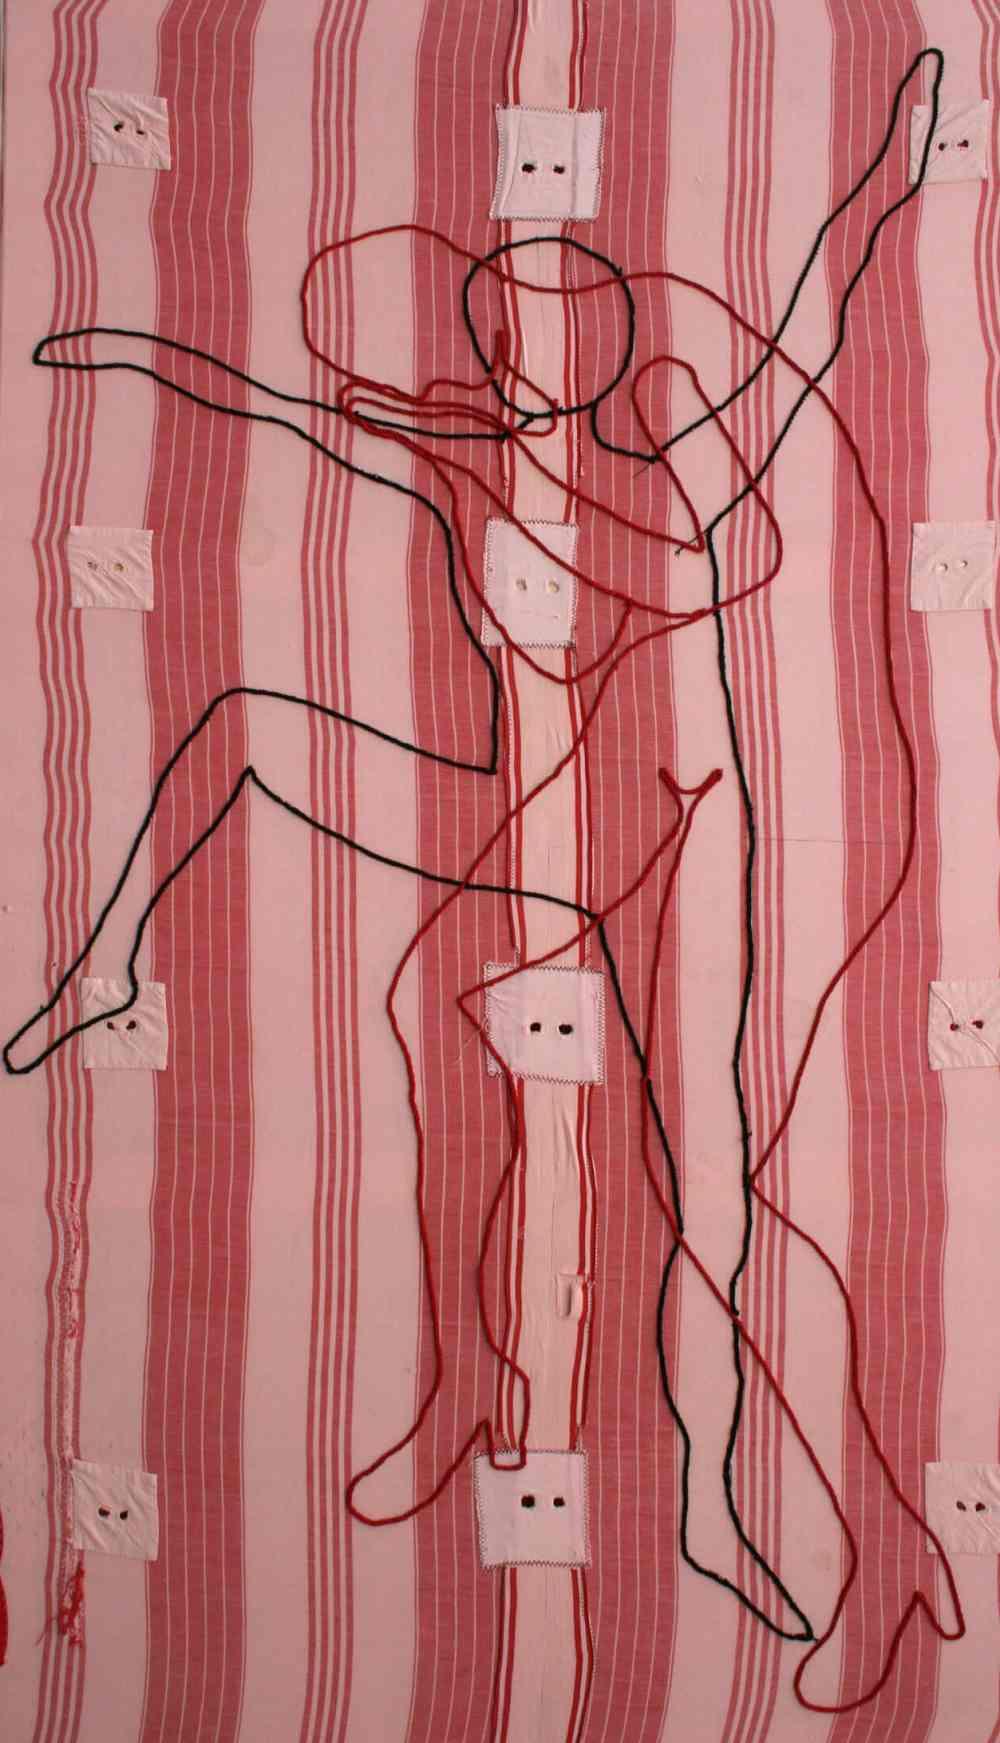 Colchón para tres II, 150x120, bordado sobre colchón de cama. Ma Jesús Manzanares.